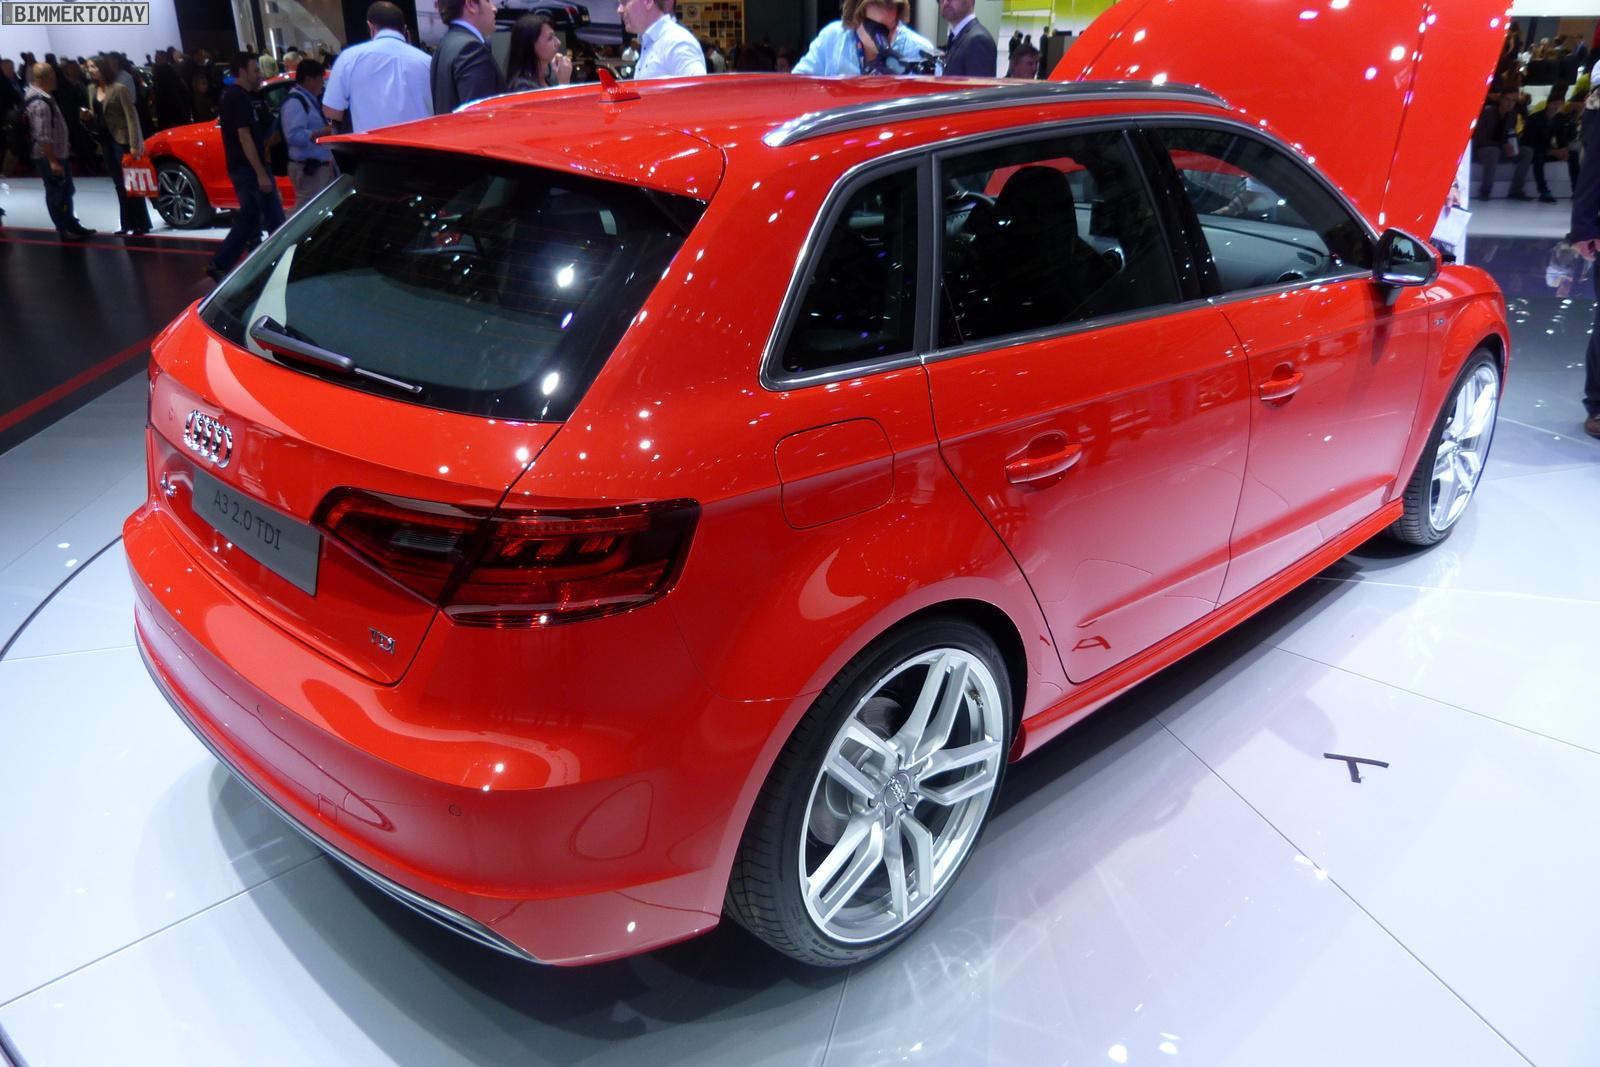 Audi A3 Sportback 2 0 Tdi Paris 2012 08